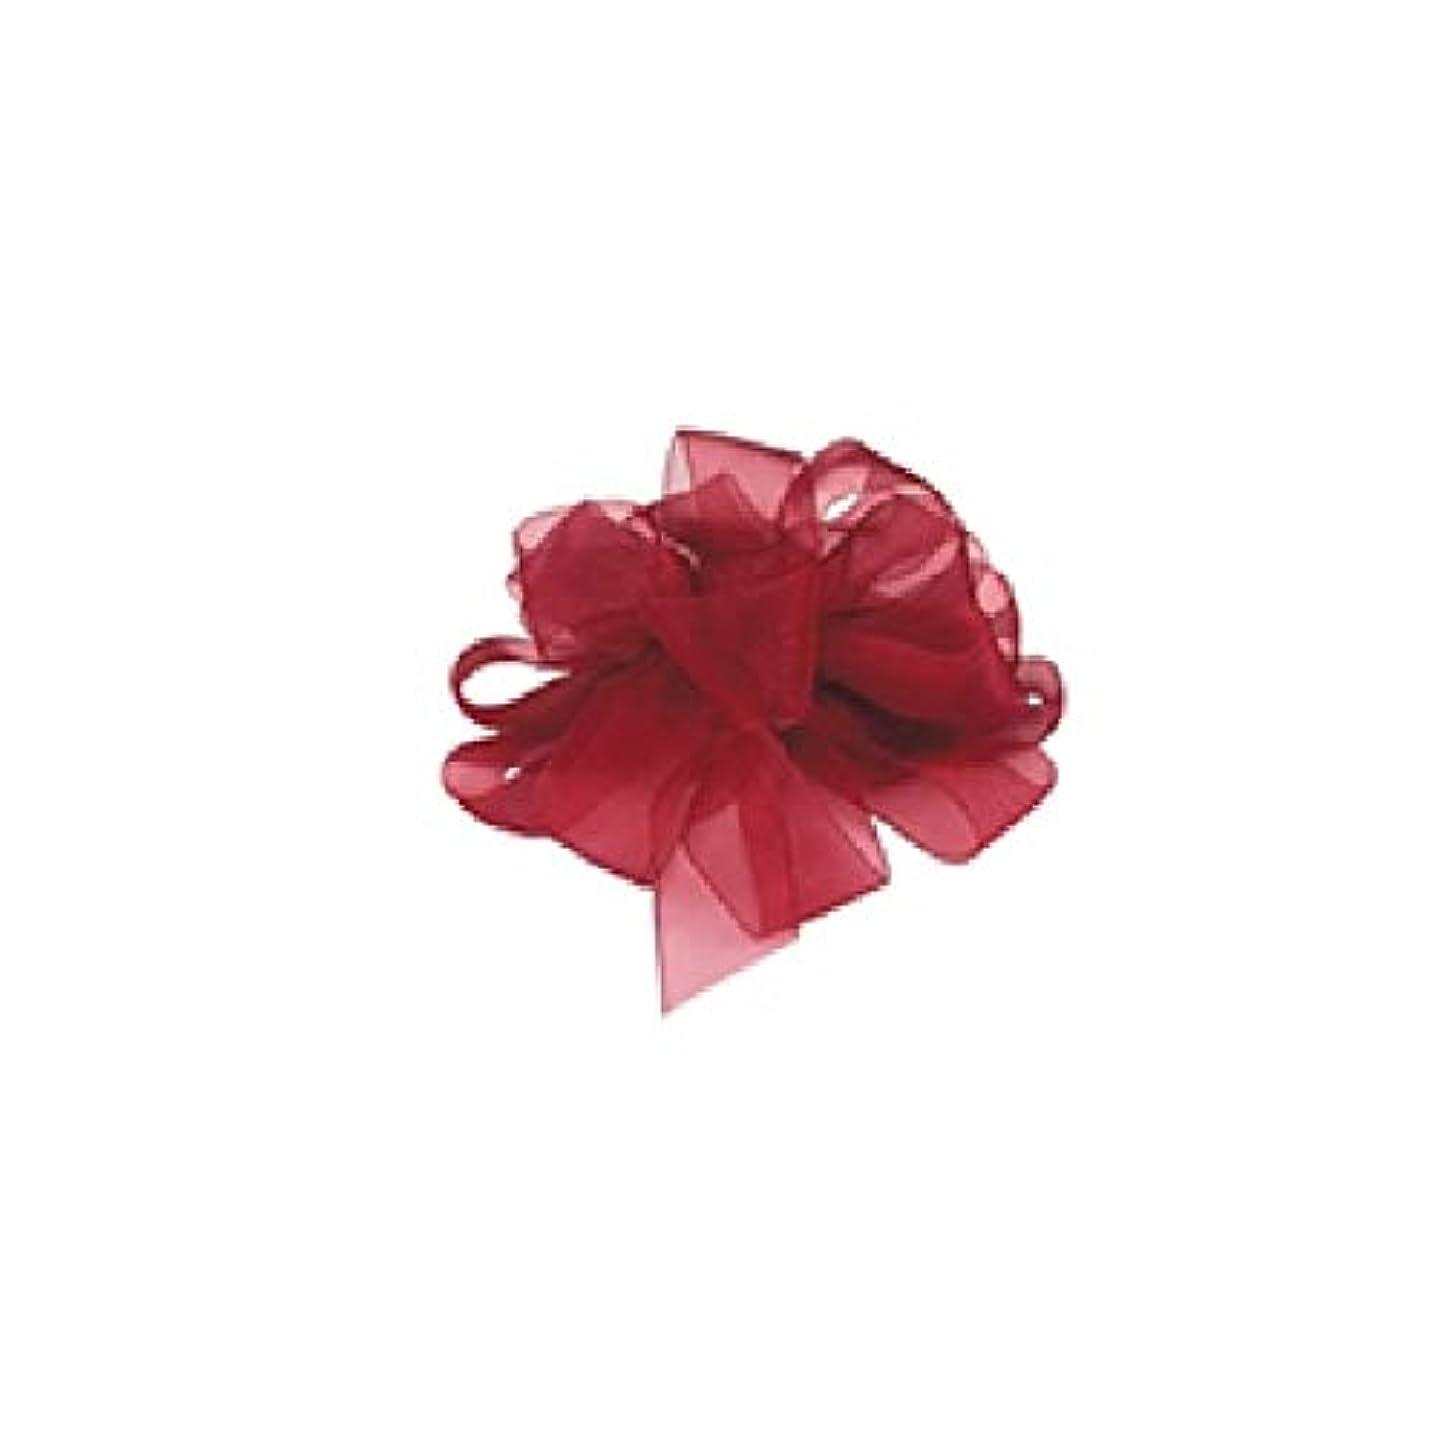 Jodhpuri Inc. R0210020 Fabric-Ribbons Red